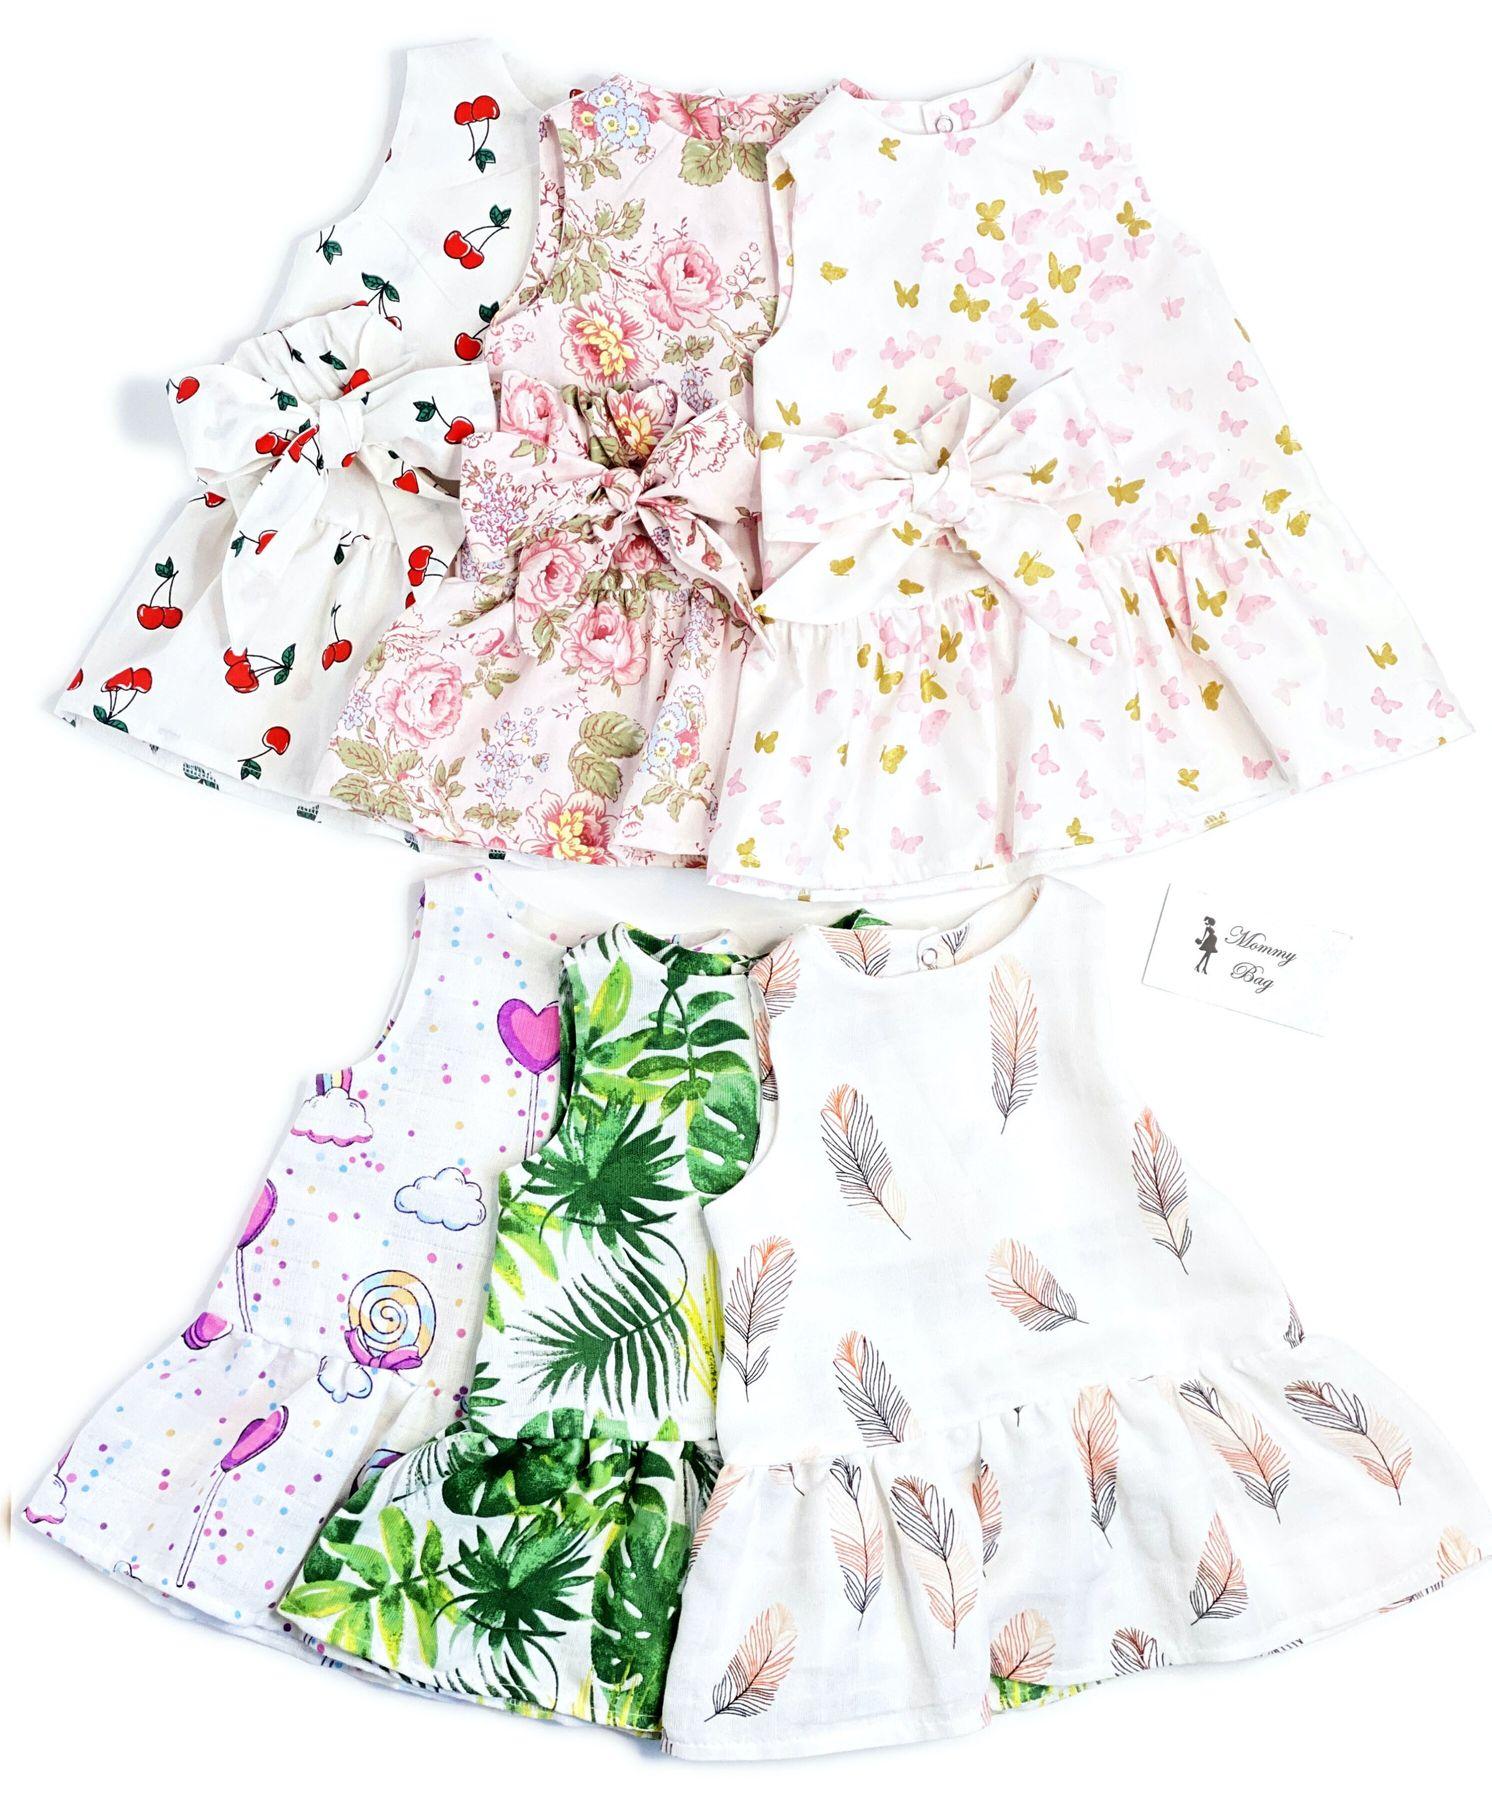 Муслиновое платье RoyalBaby Тропик р.62, 0-6 мес. Зображення 2